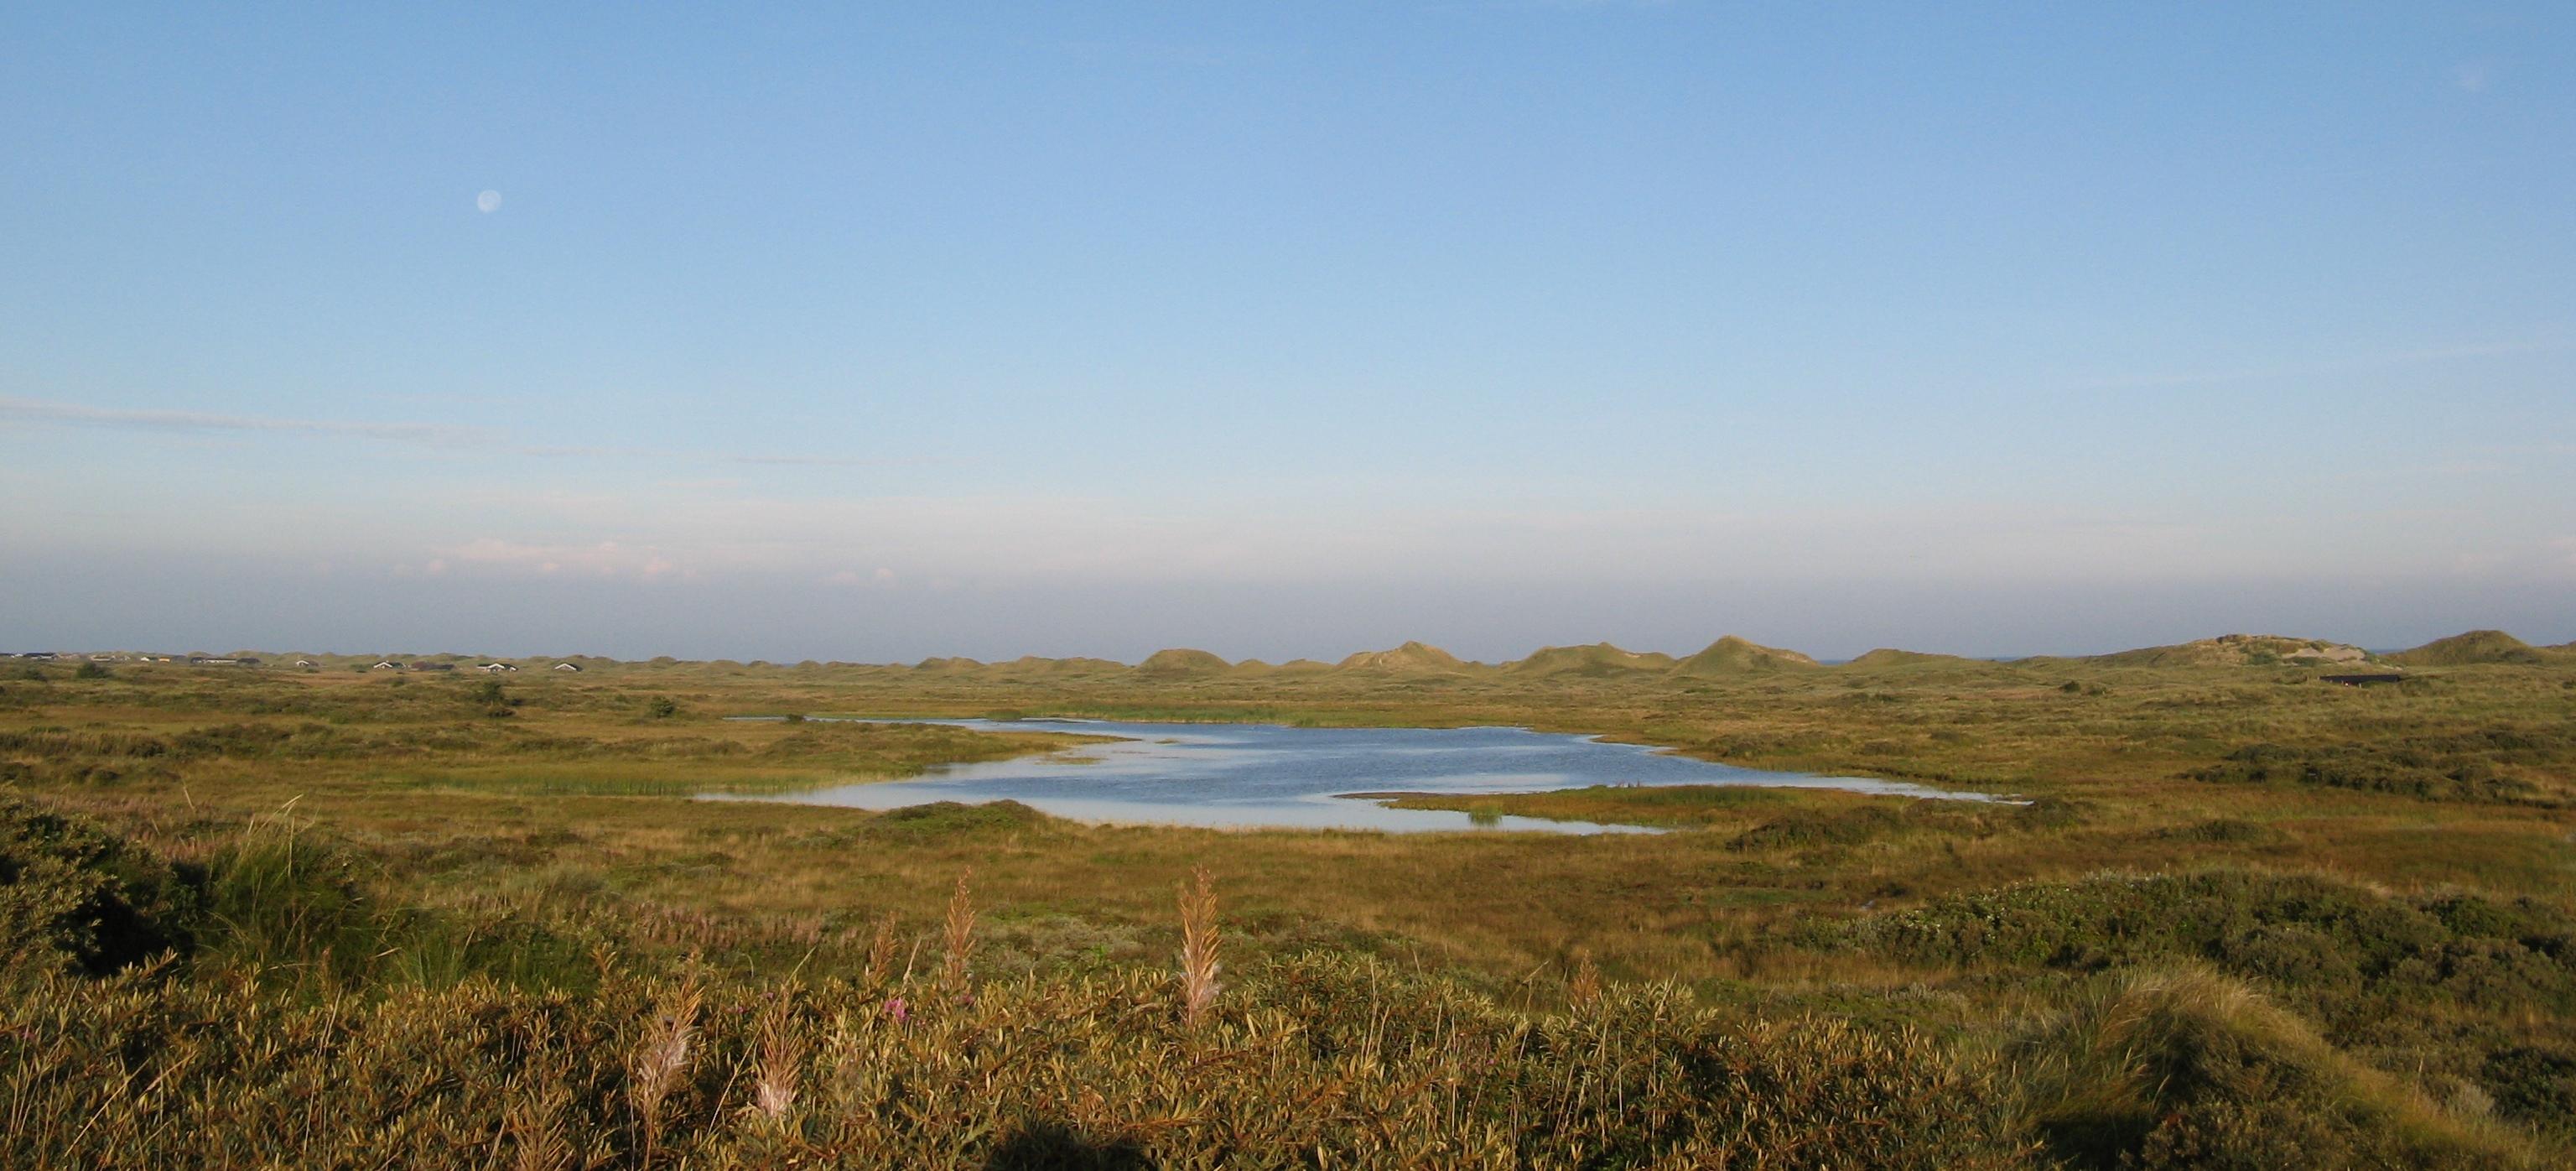 Vandplasken landskab